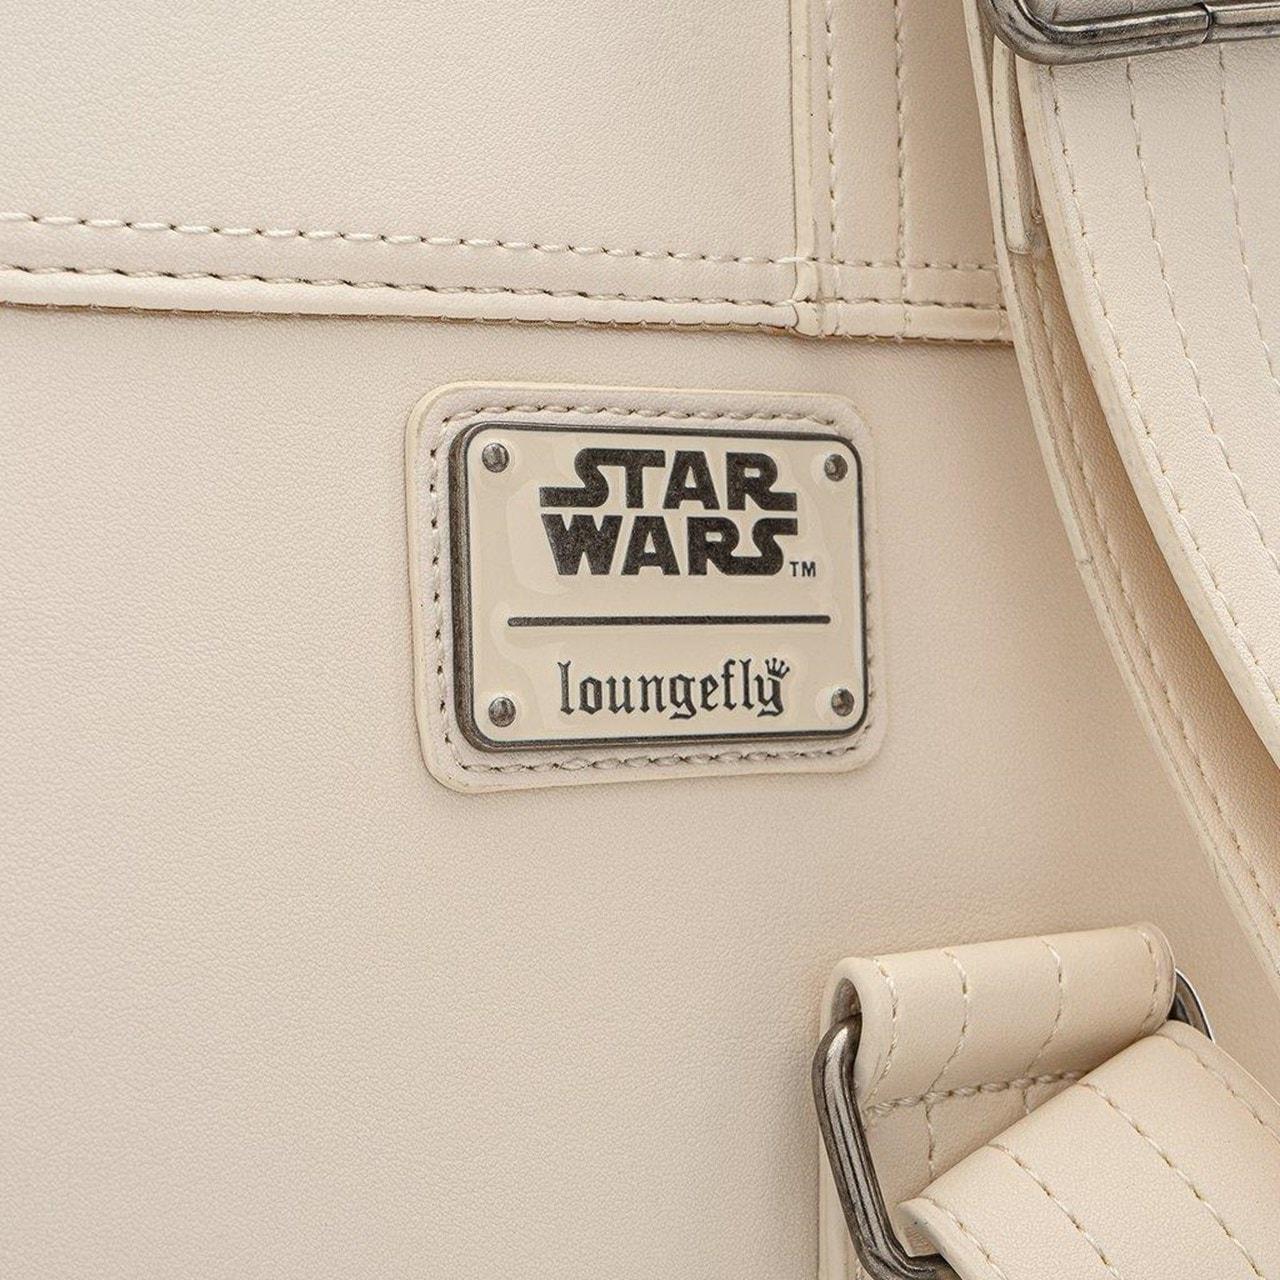 Loungefly X Star Wars Rey Cosplay Sling Bag - 3